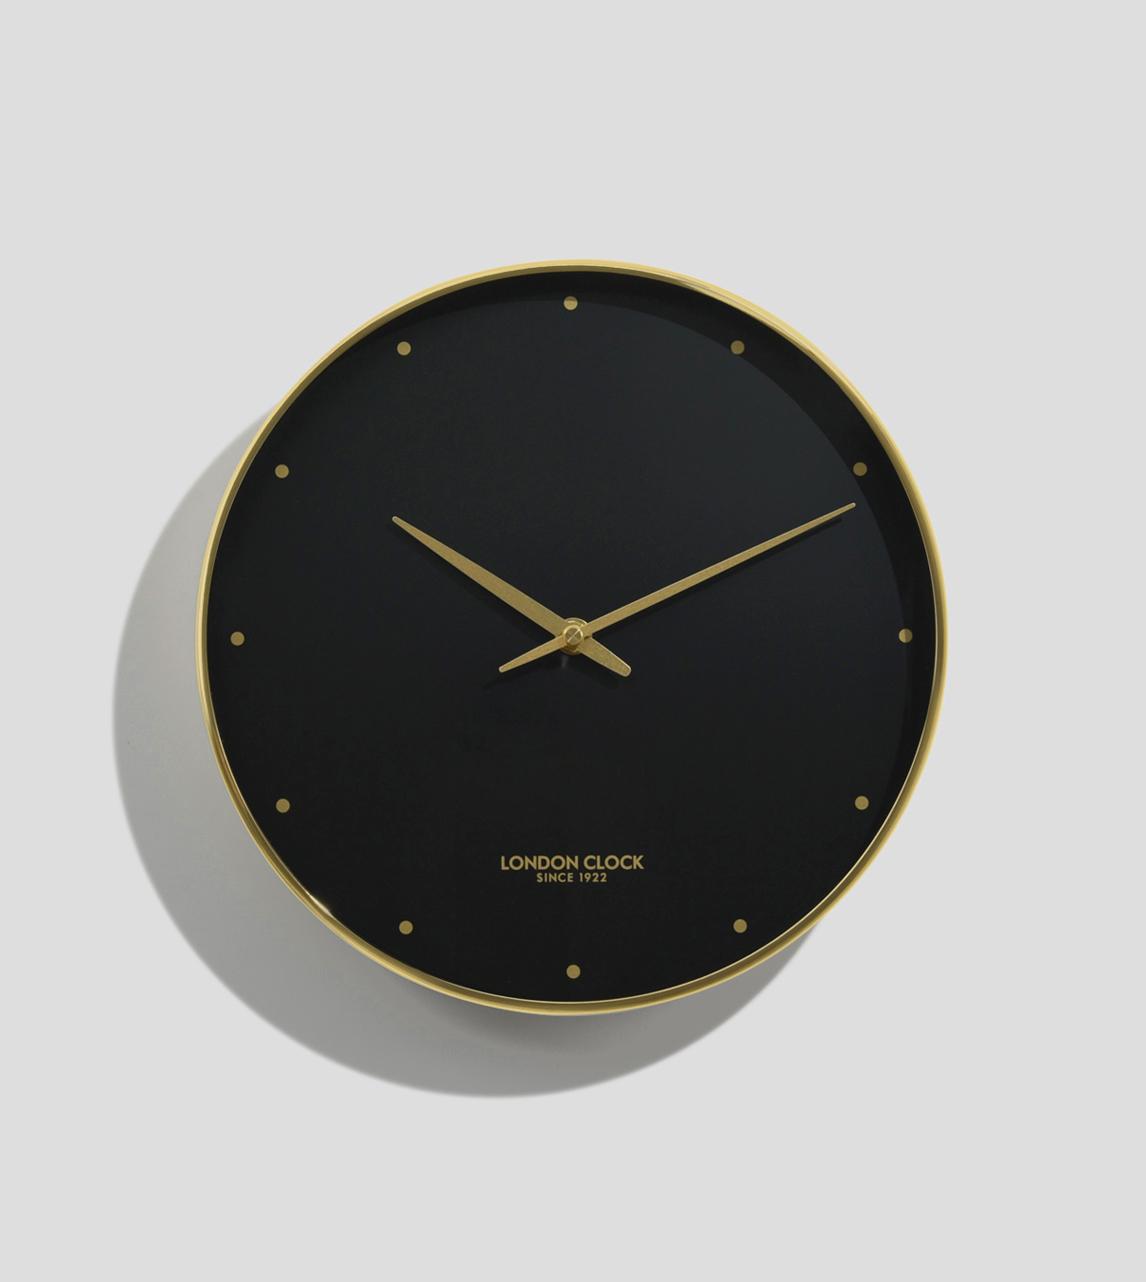 London Clock Durrant Gold Black London Clock Company Swoon